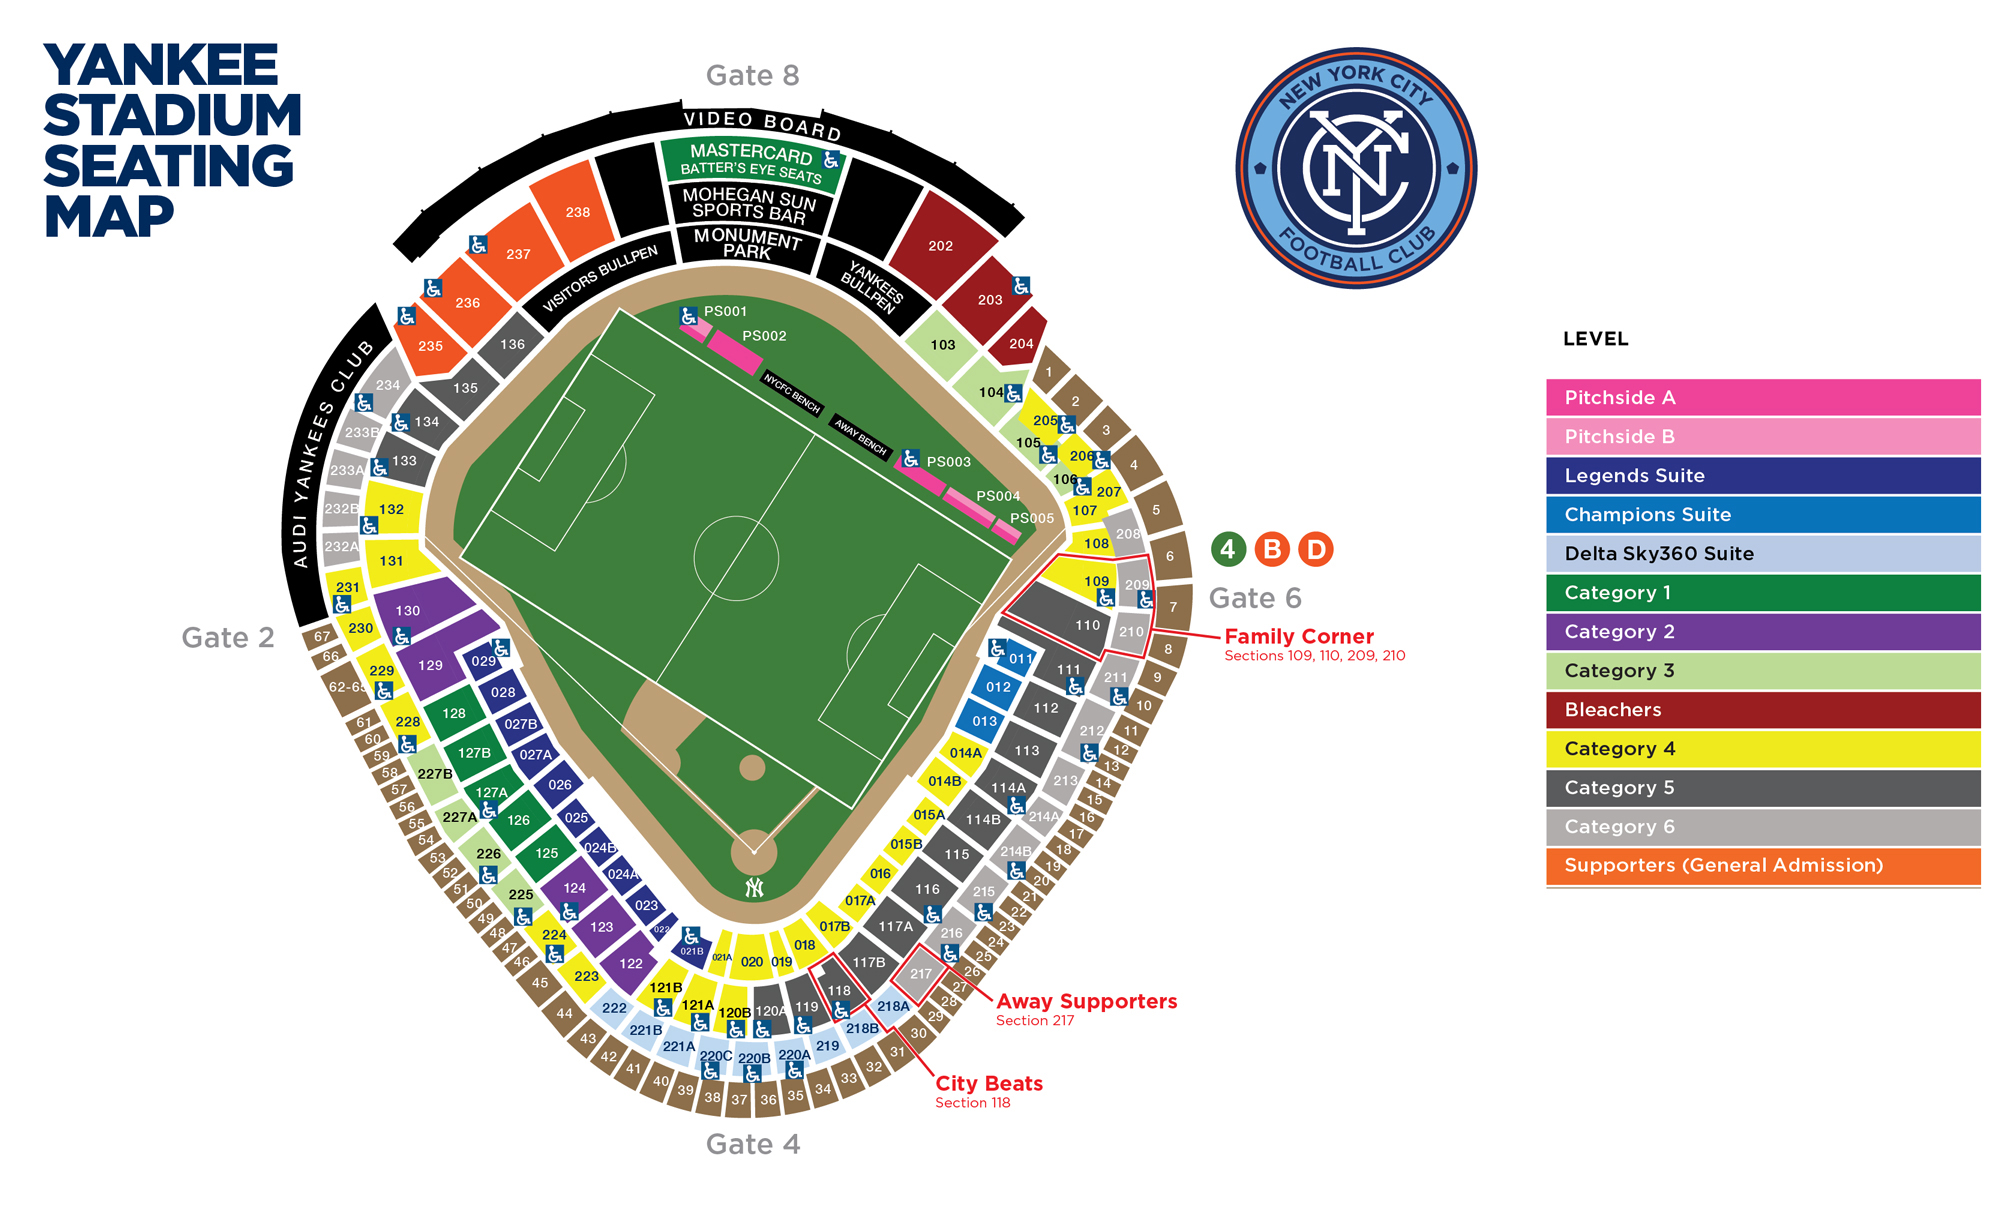 yankees stadium seating chart - Timiz.conceptzmusic.co